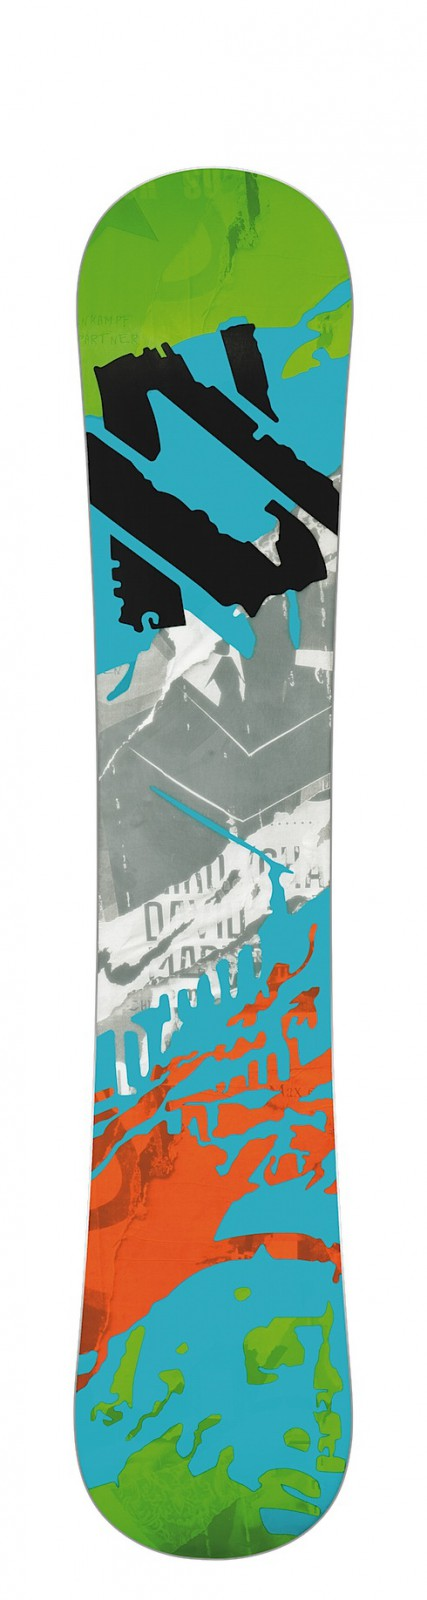 44flavours — Völkl Snowboards — Riot SQD